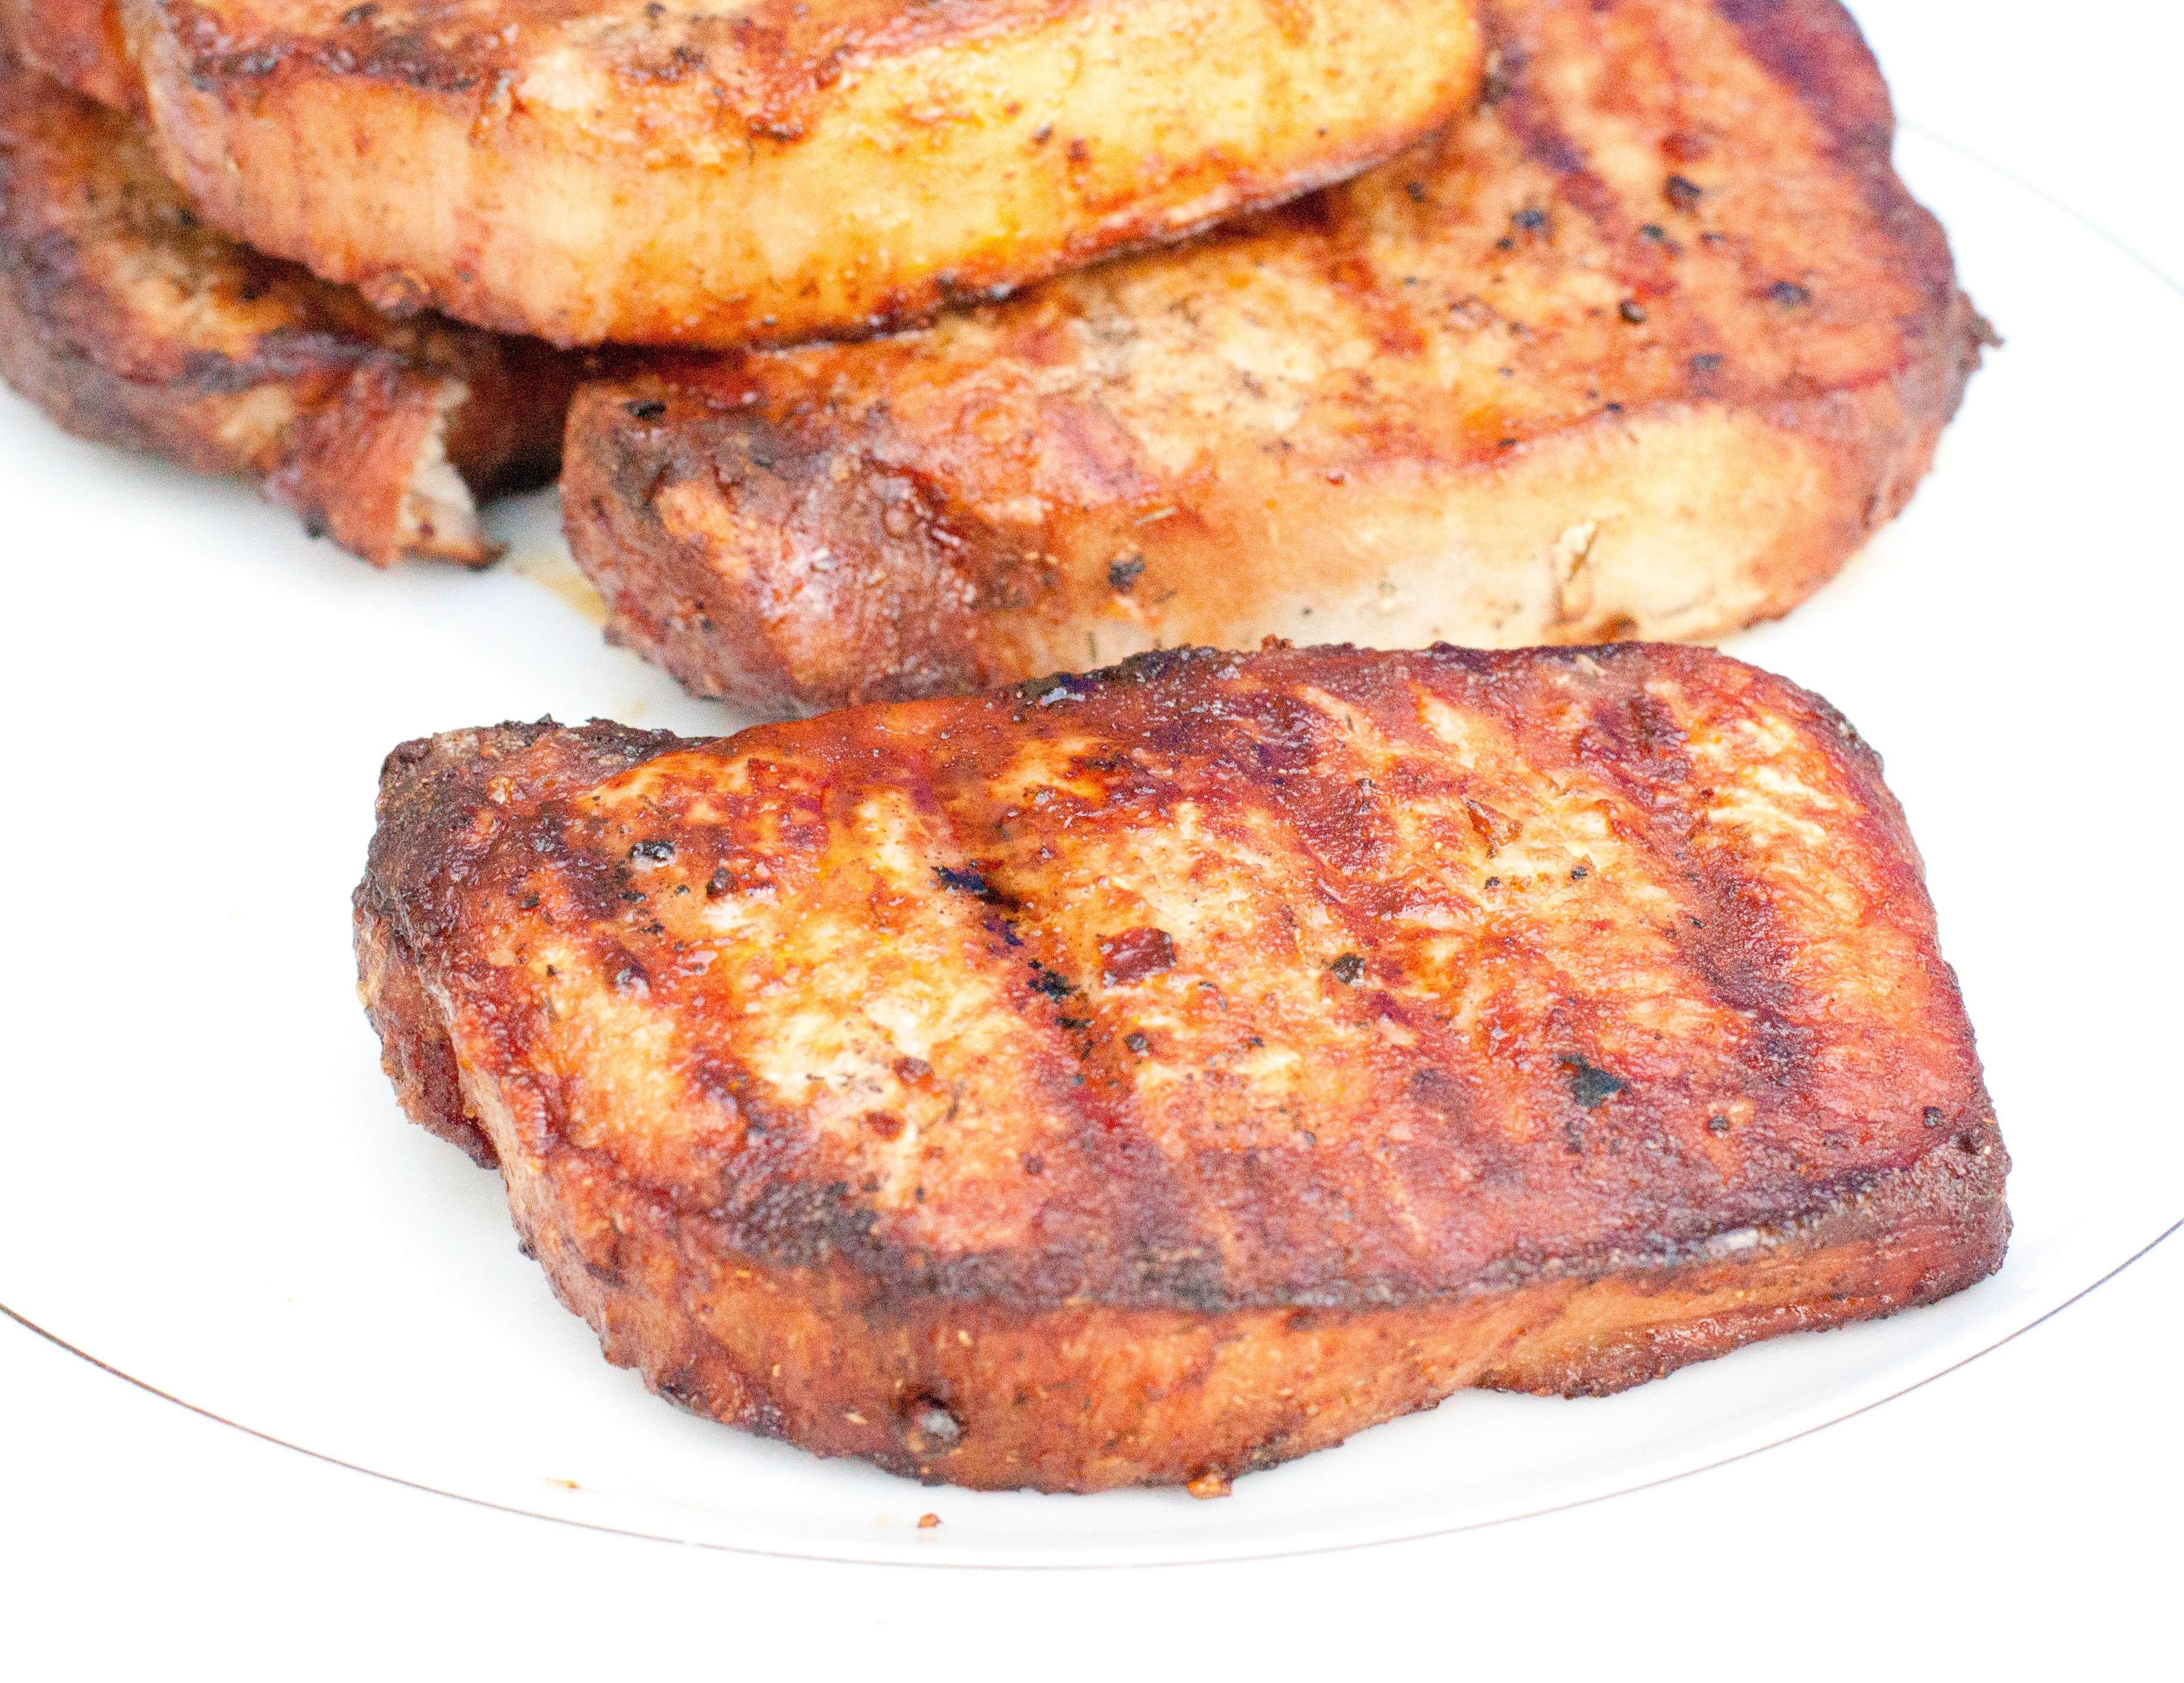 Grilling Boneless Pork Chops  Grilled Boneless Pork Chops Served From Scratch